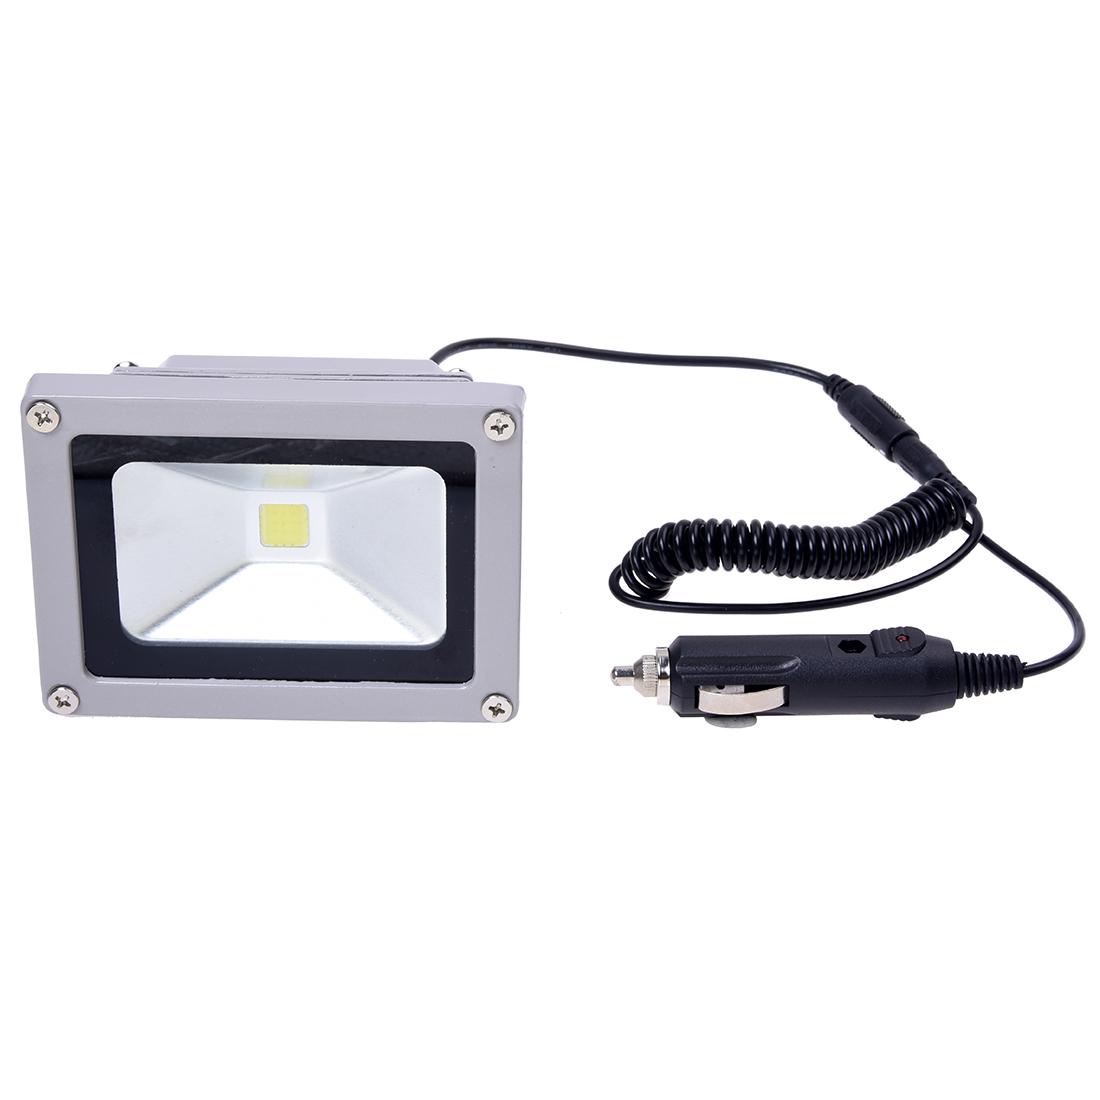 Led Spotlight Headlamp: HEADLIGHT HEADLAMP CAR SPOTLIGHT 12V LED 10W 7000K WHITE